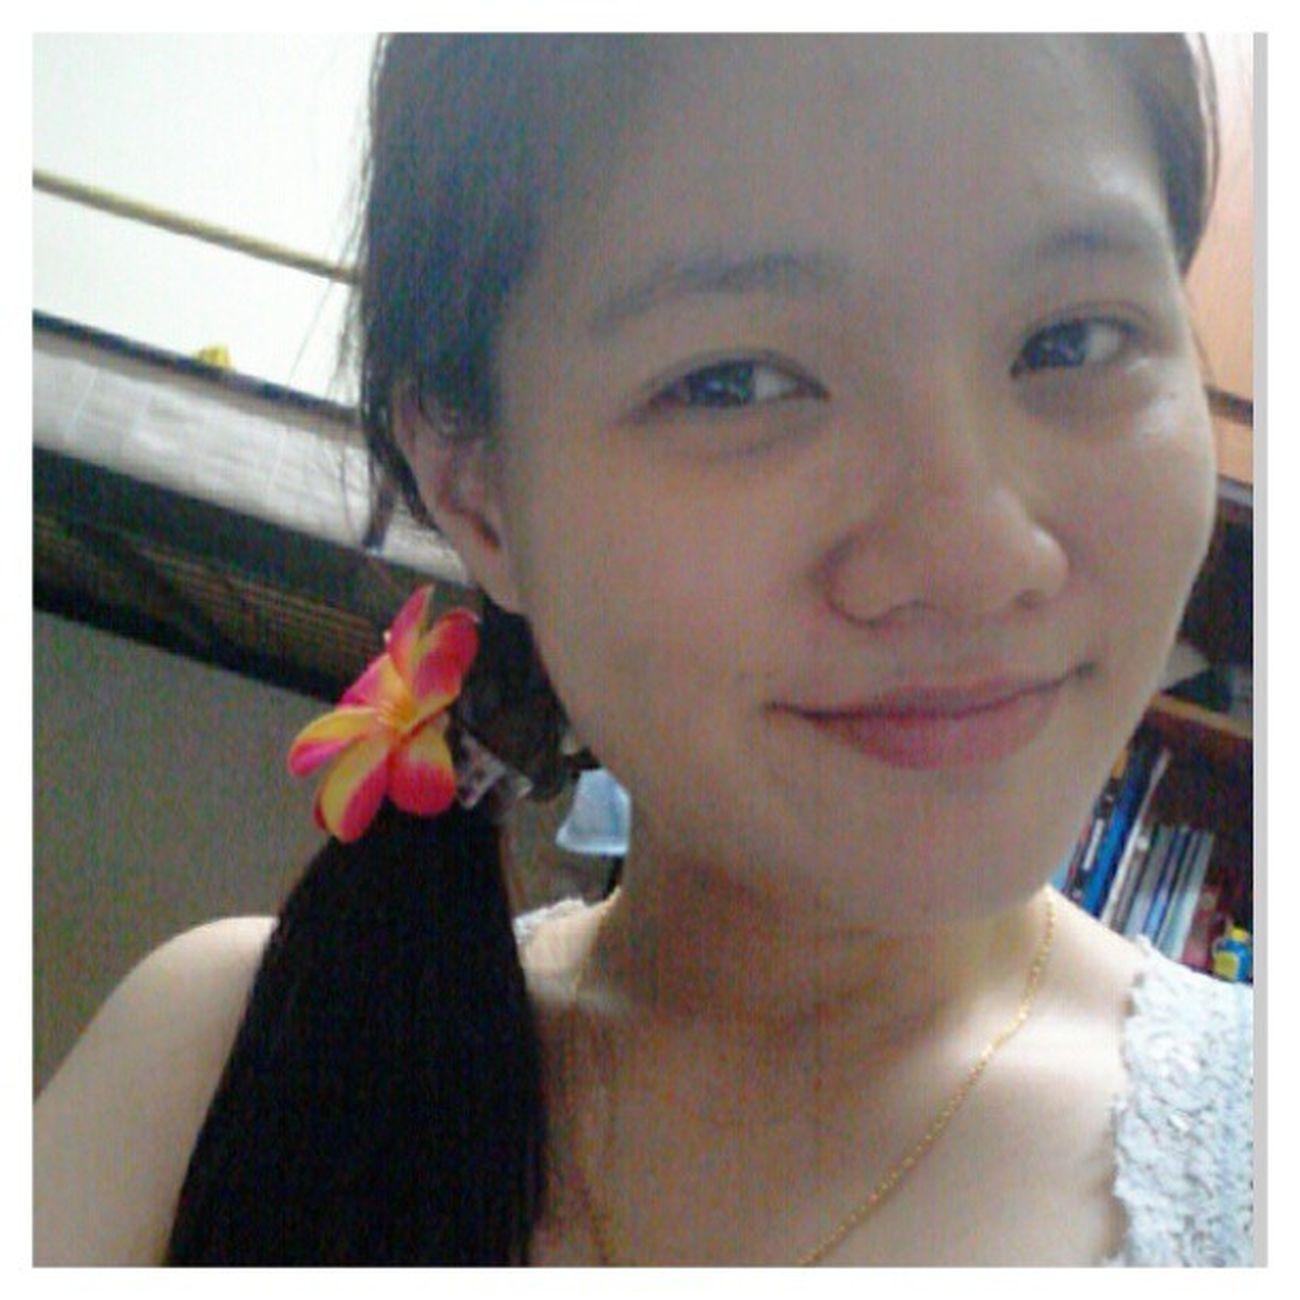 Flowerpin Eyebag